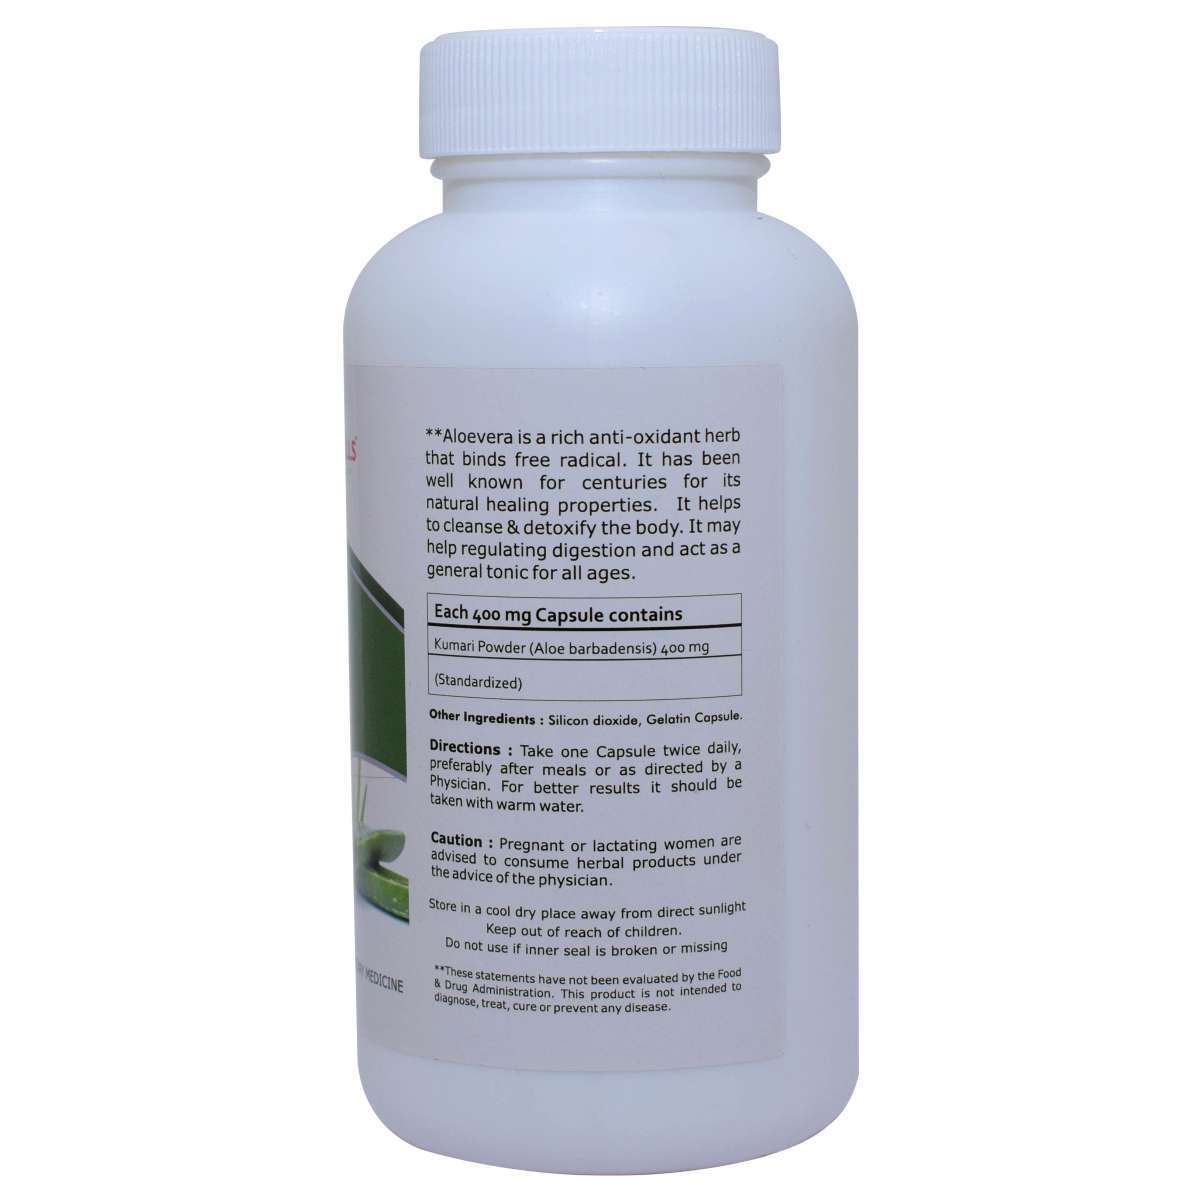 Aloevera capsule healthy skin & Digestion - Aloehills